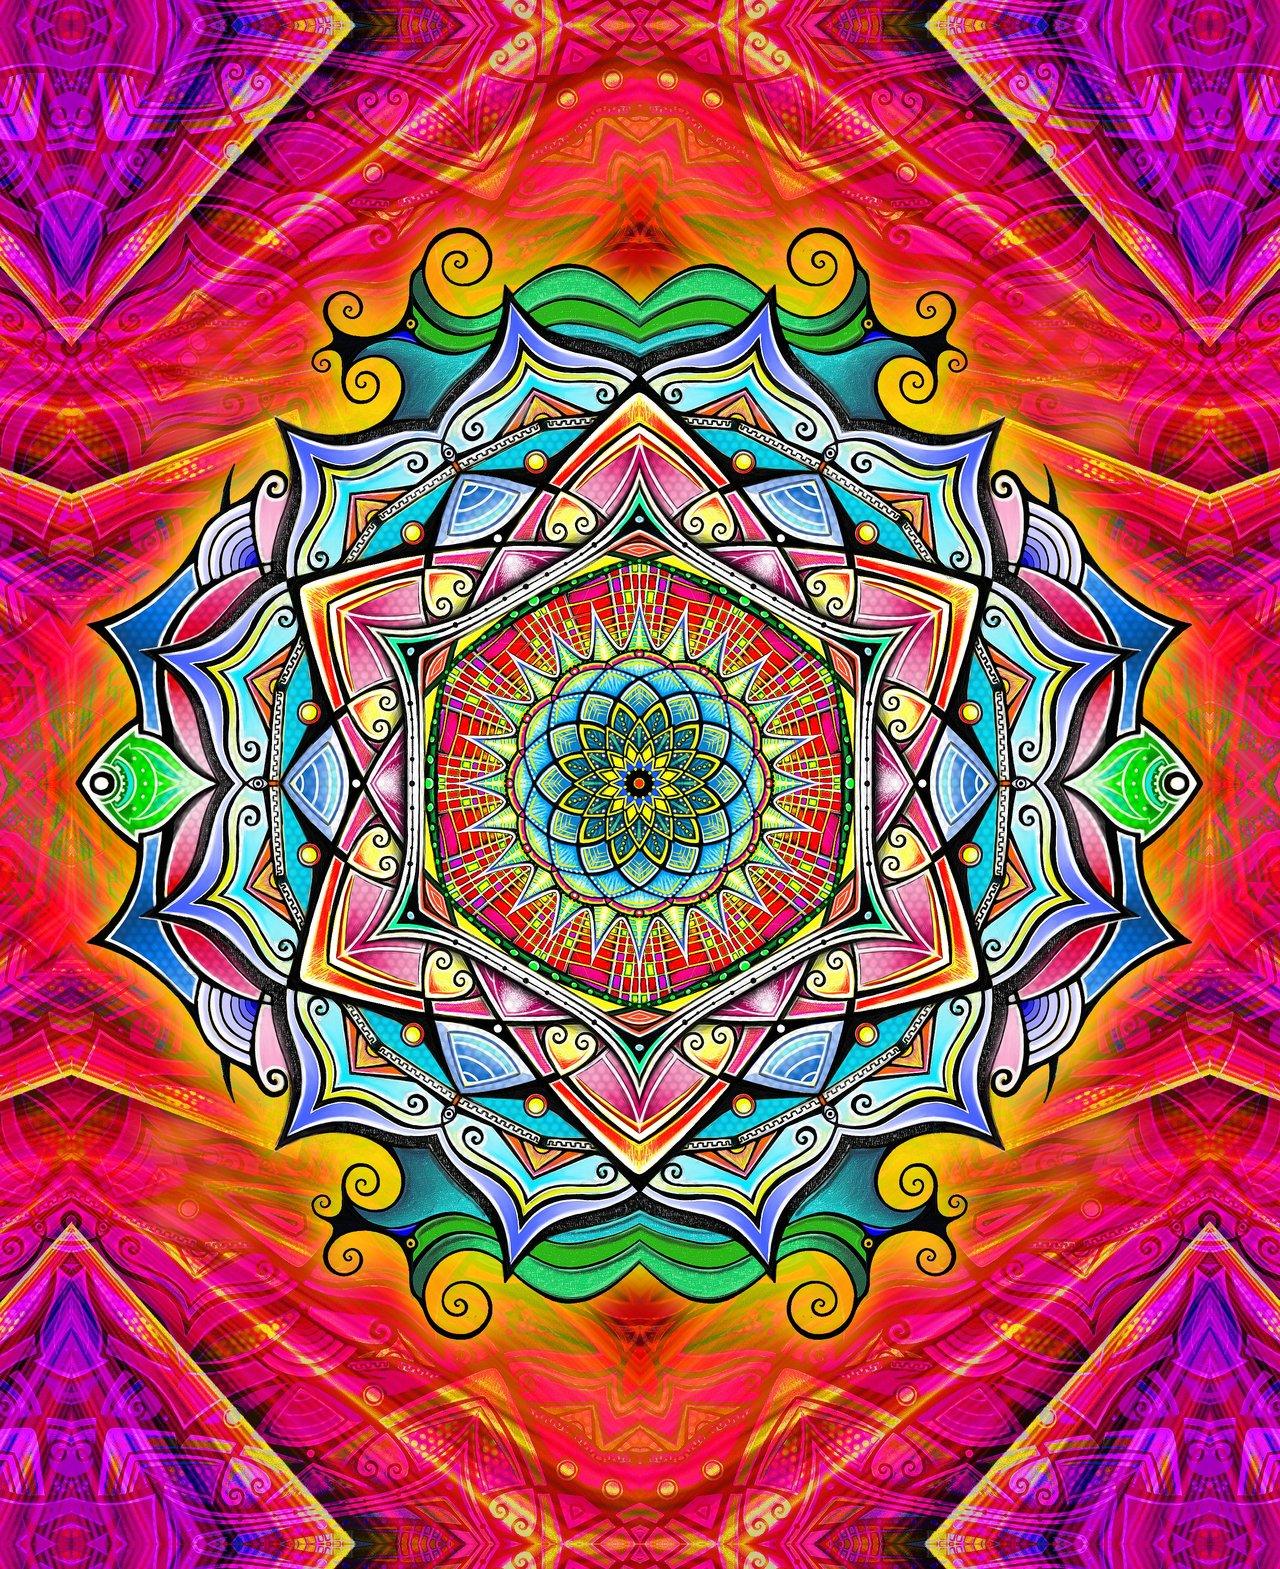 Mandala Wallpaper Tumblr Mandala Wallpaper Tumblr 1280x1569